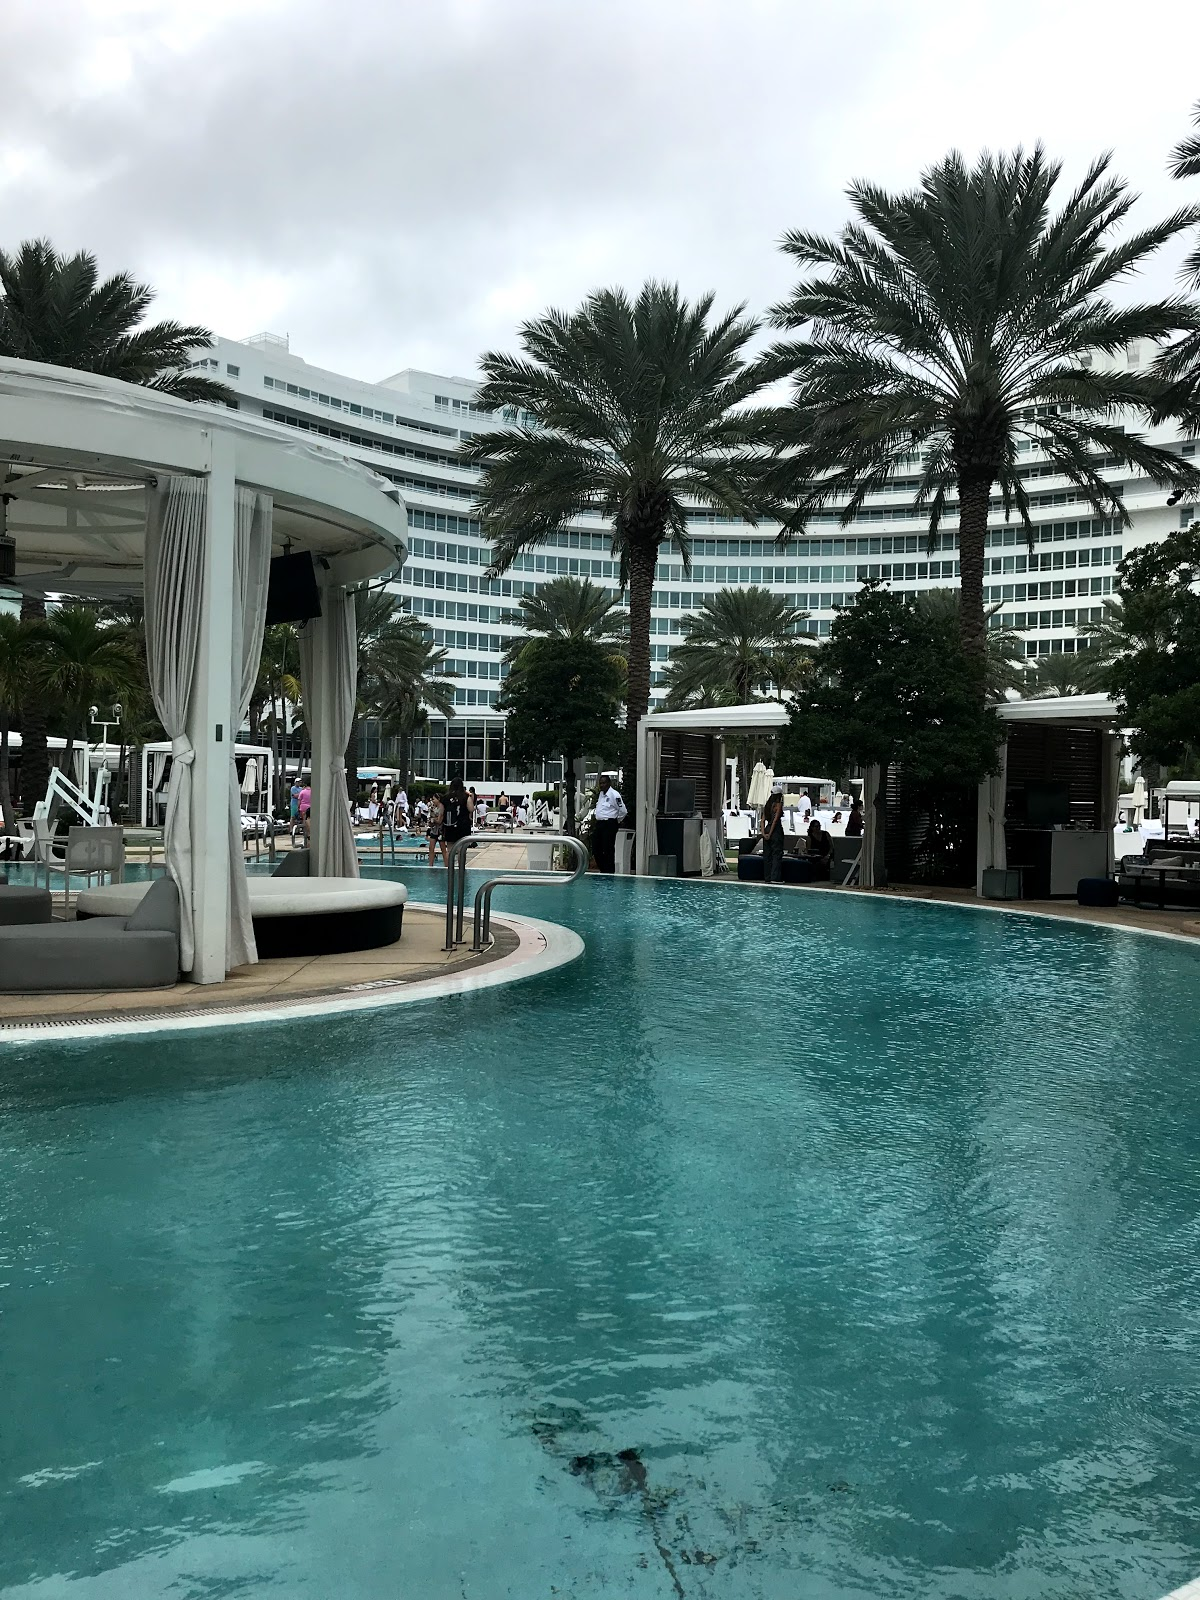 Fountainbleau hotel pool